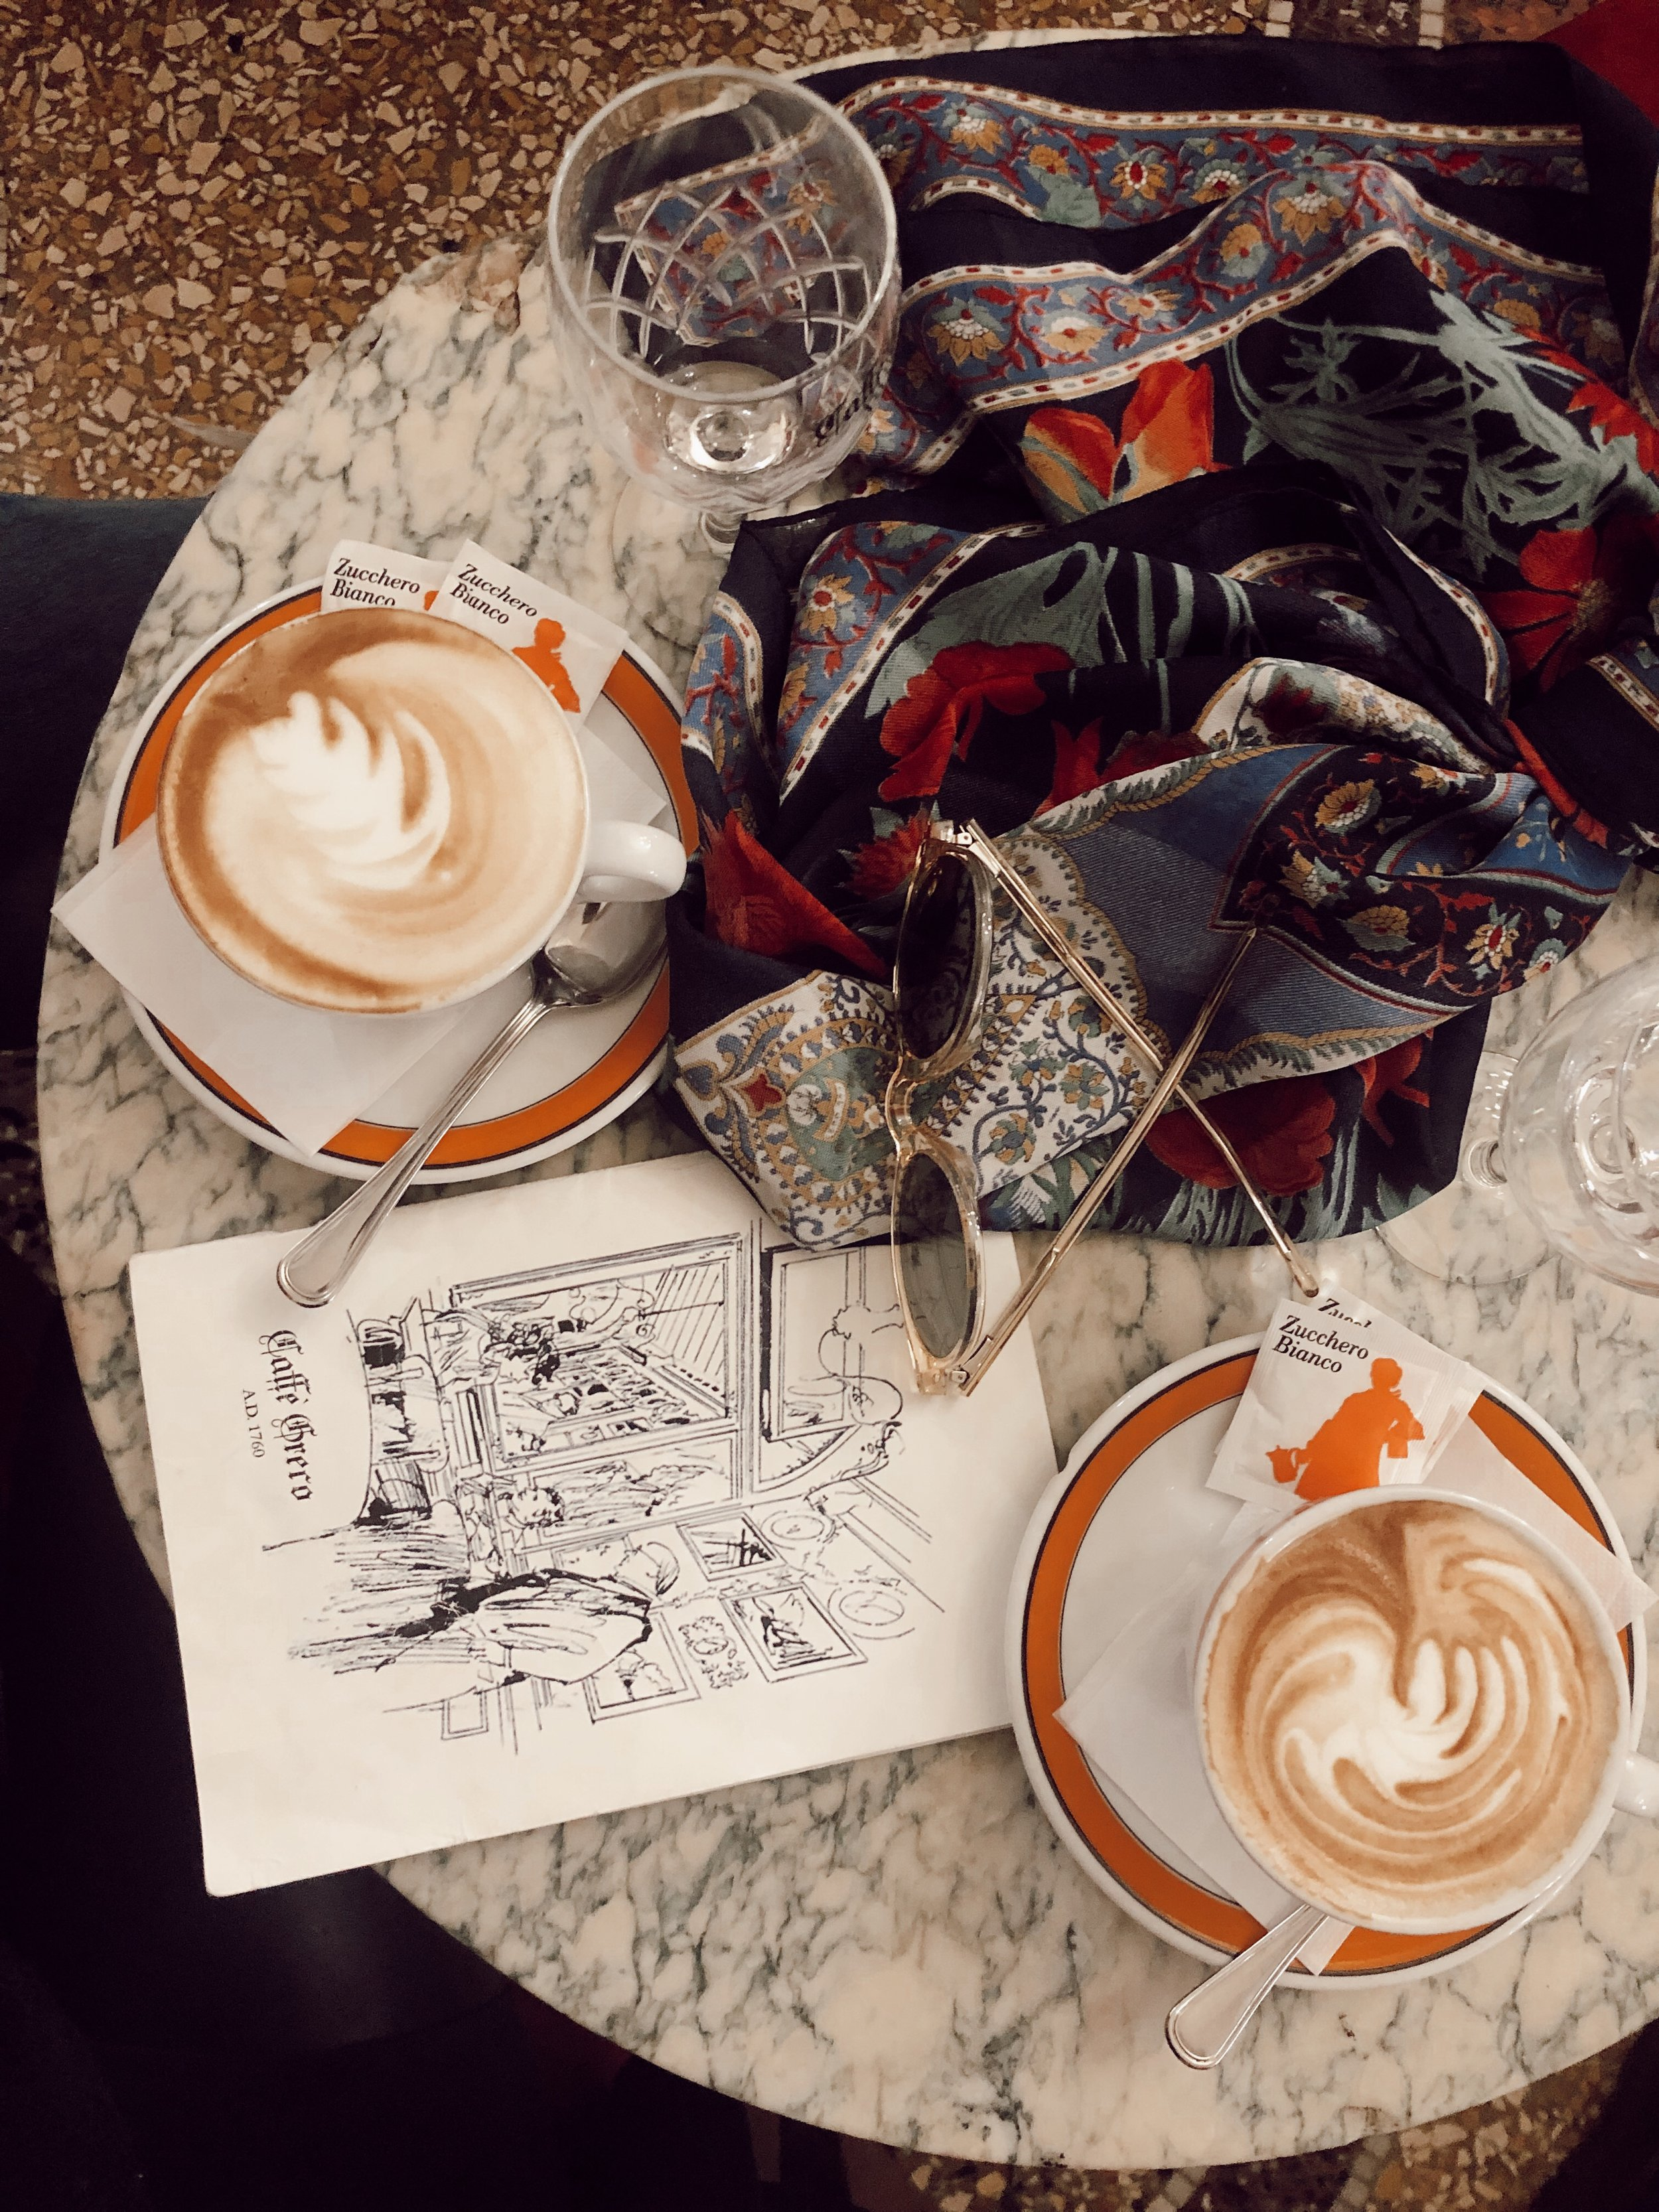 caffe greco.JPG